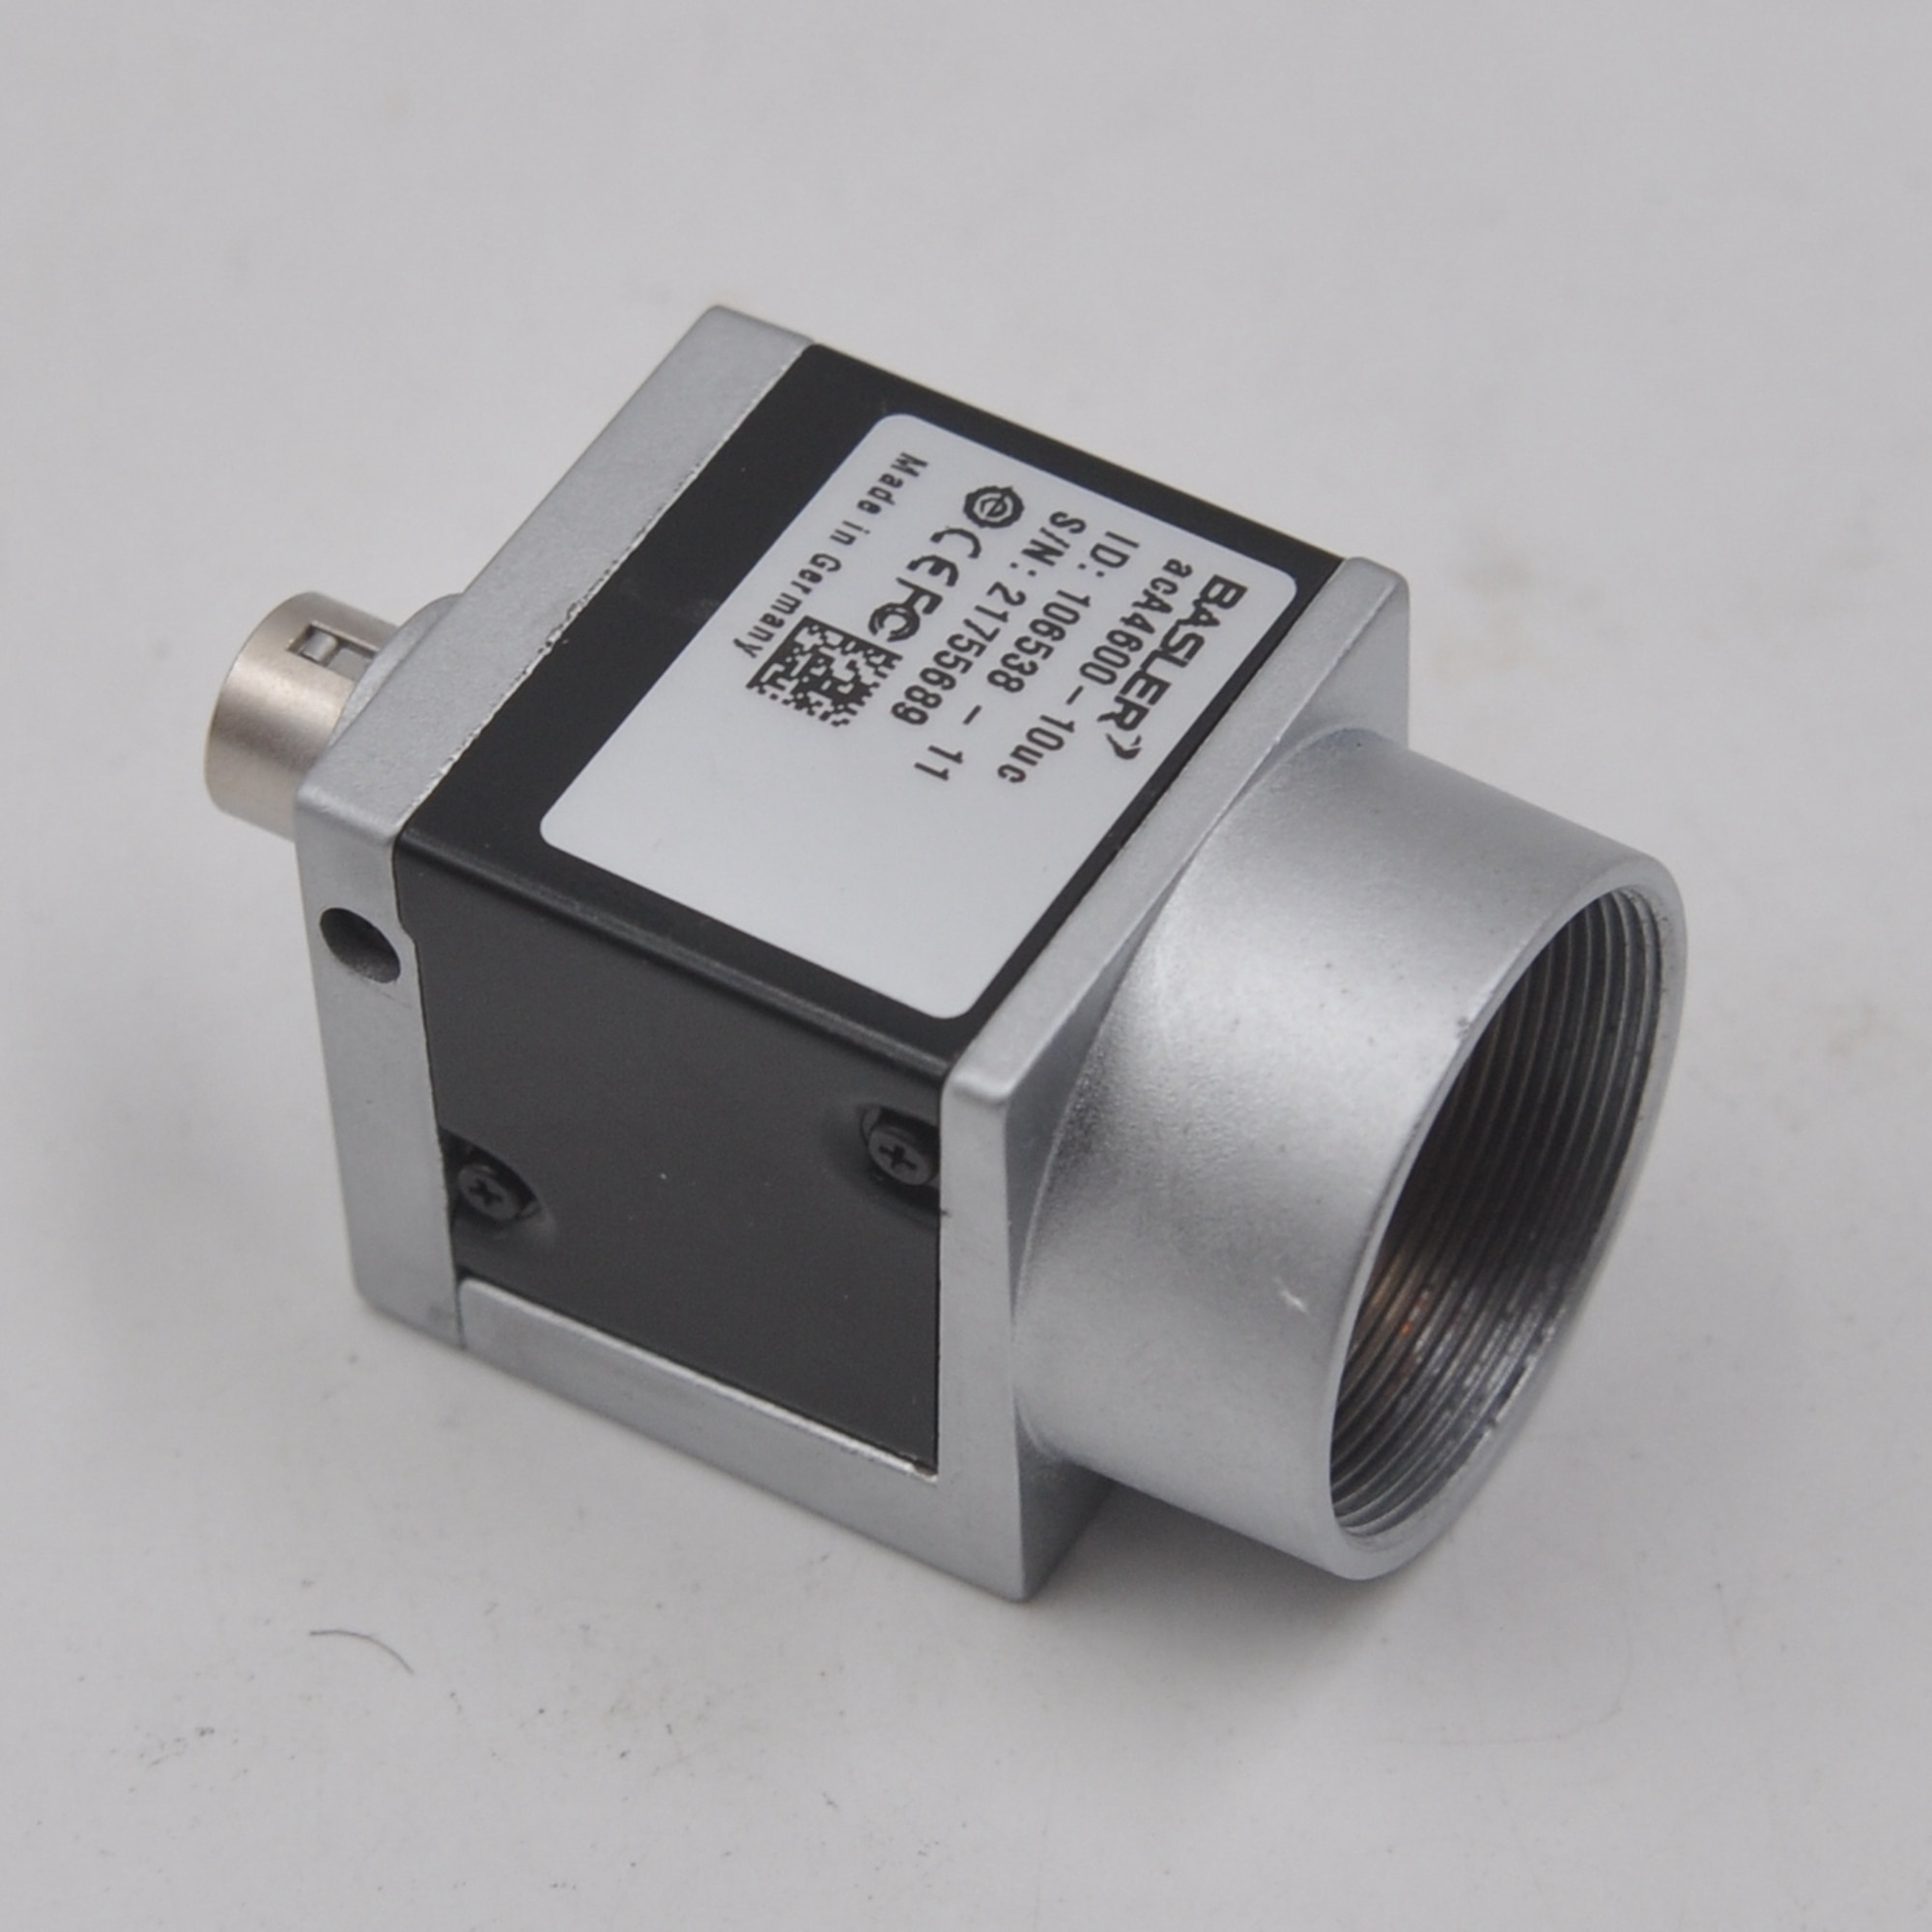 Cámara industrial de color BASLER acA4600-10uc USB 3,0 CCD 14 millones de píxeles